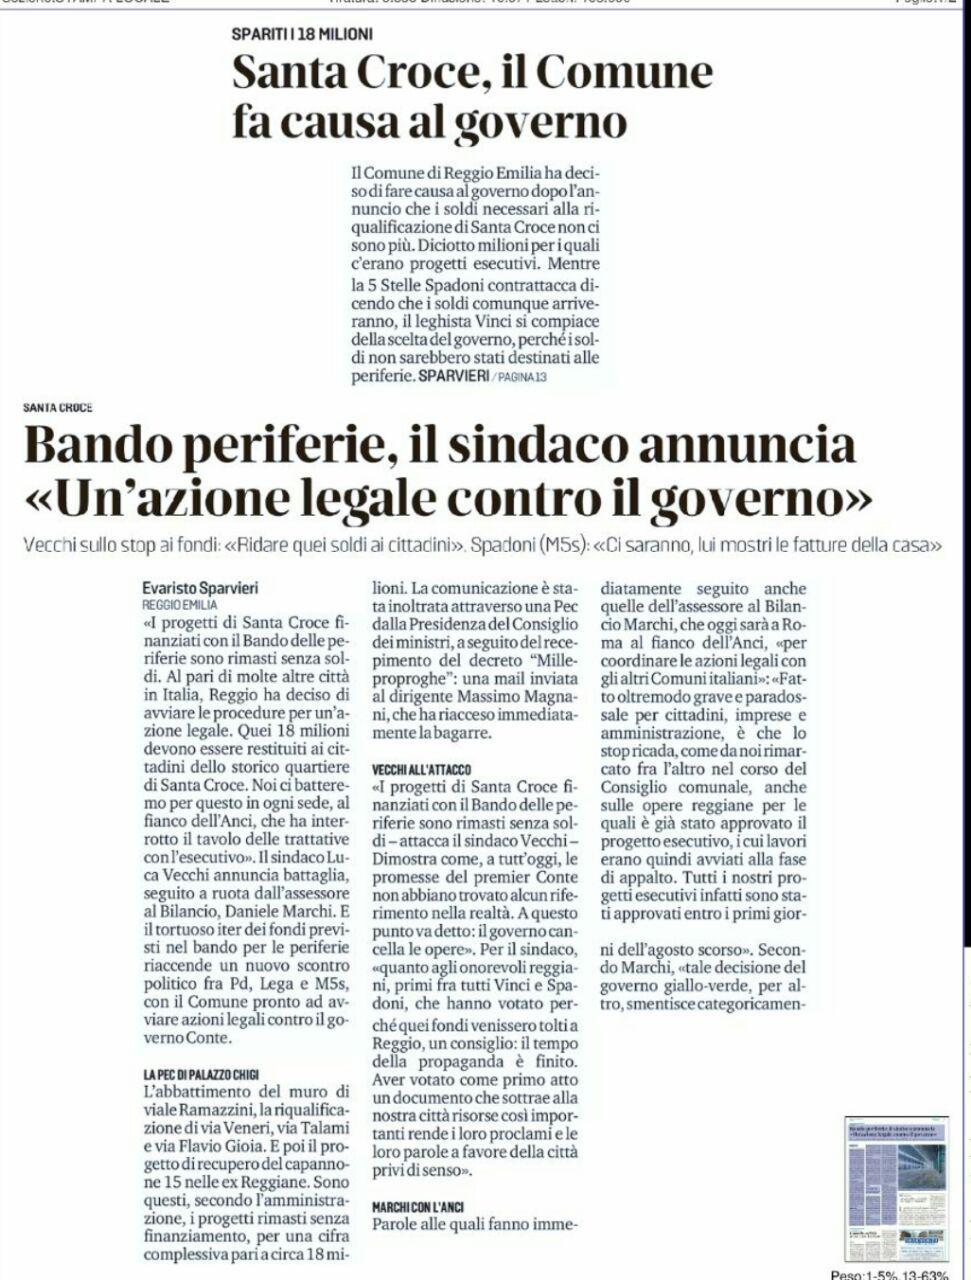 Rs_tweet Edera Gazzetta di Reggio (1)